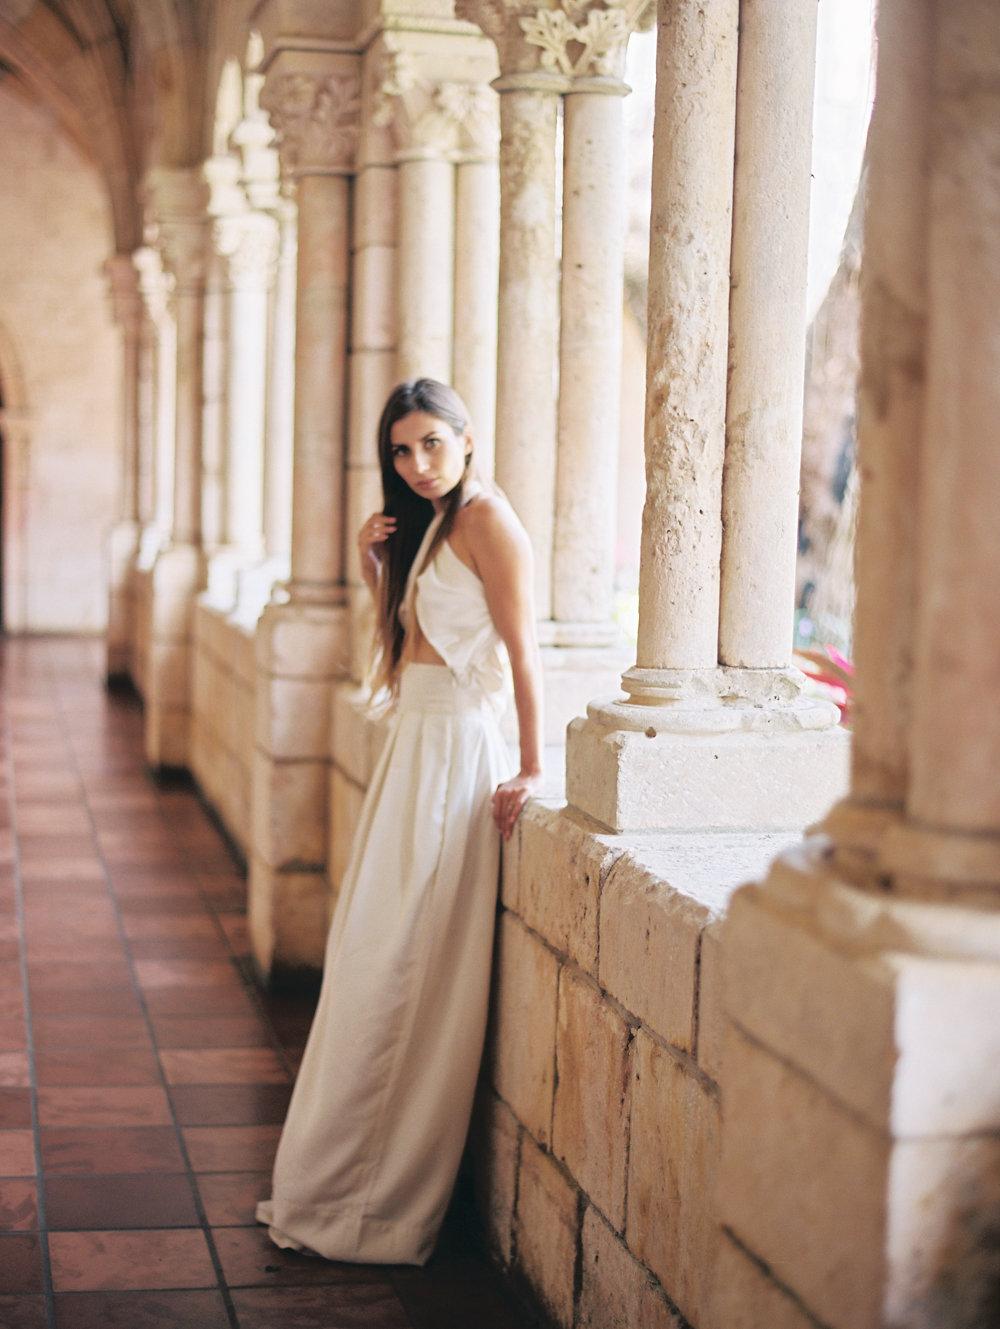 jessica-zimmerman-events-miami-bride-wedding.JPG